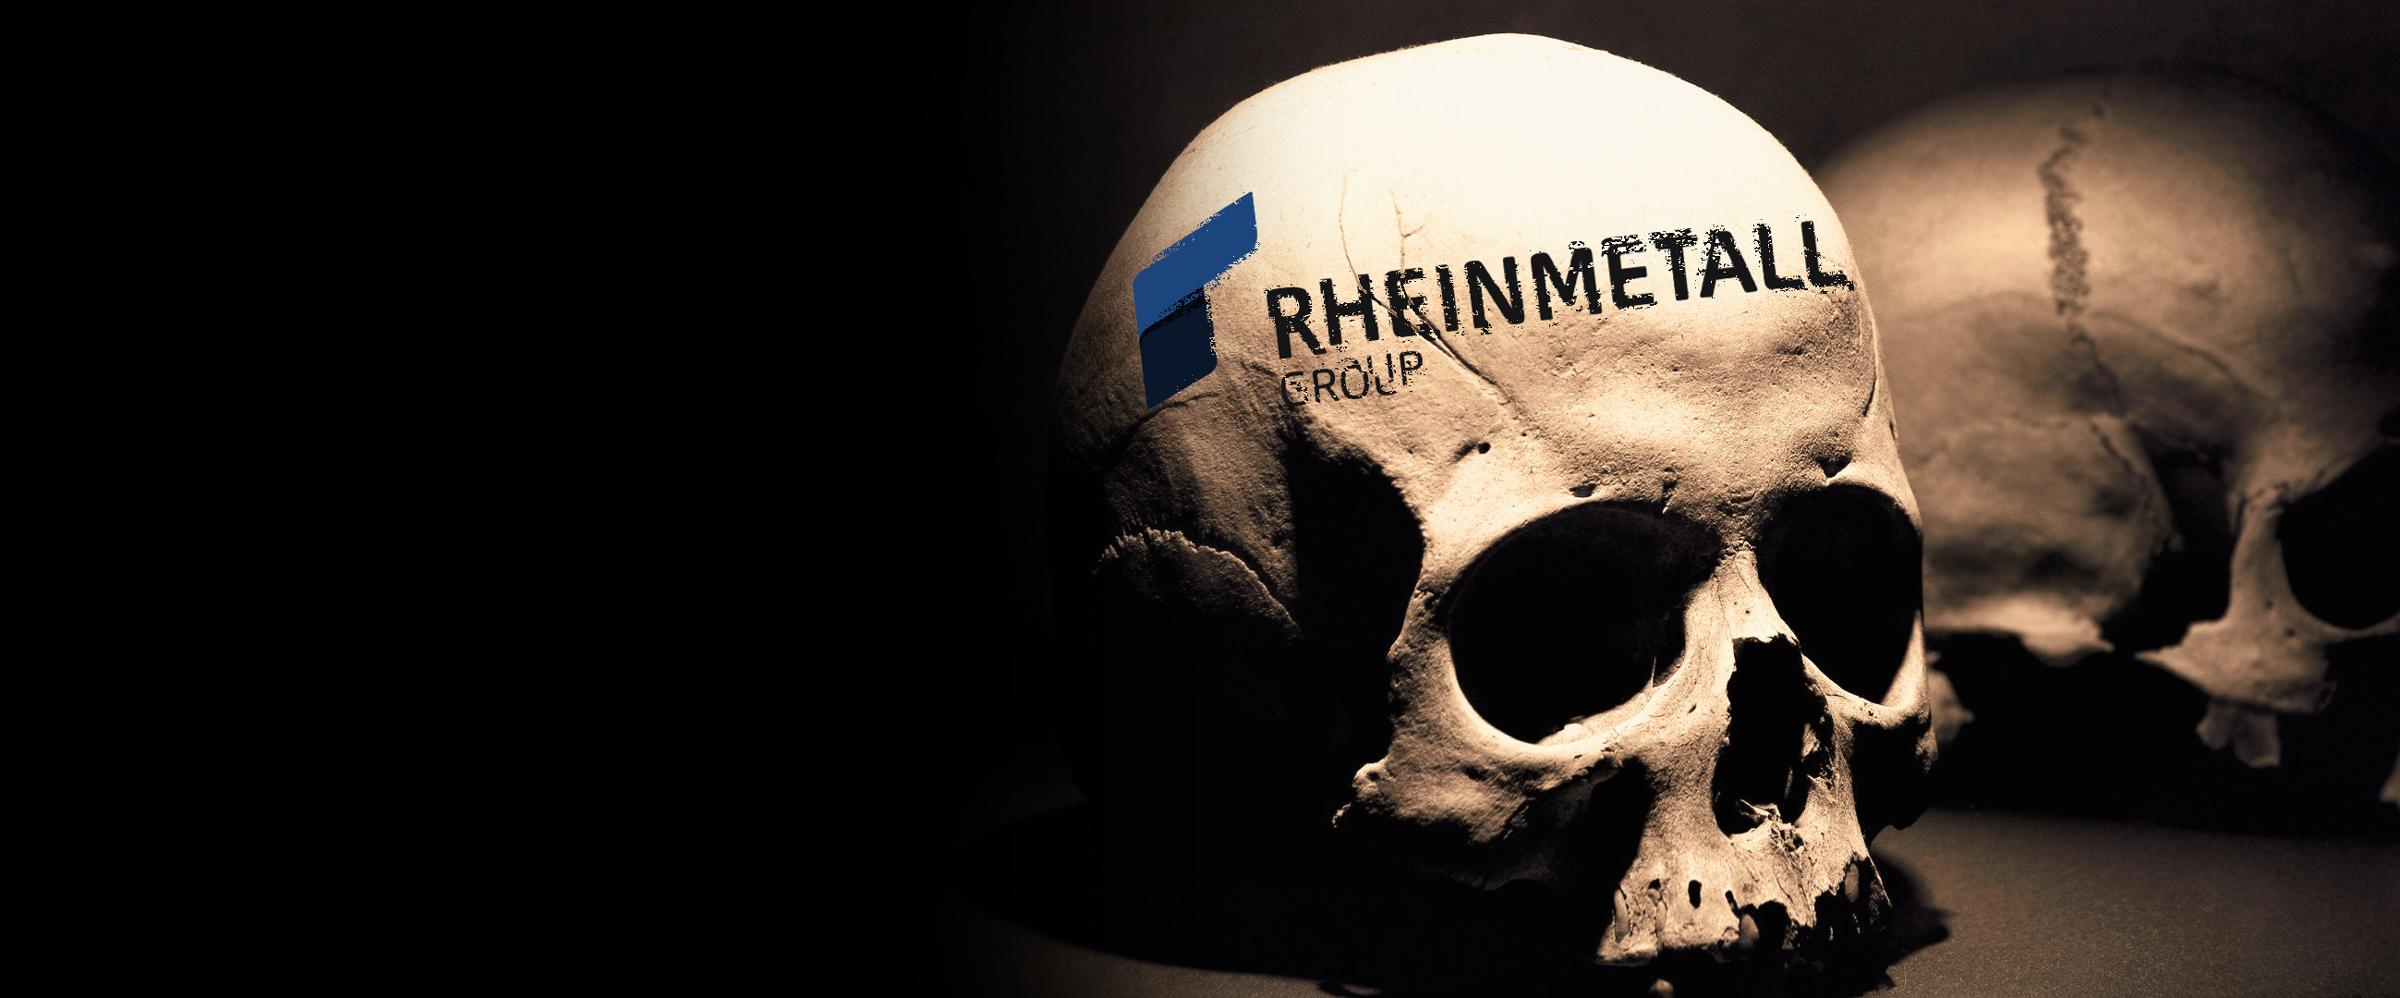 Rheinmetall entrüsten!